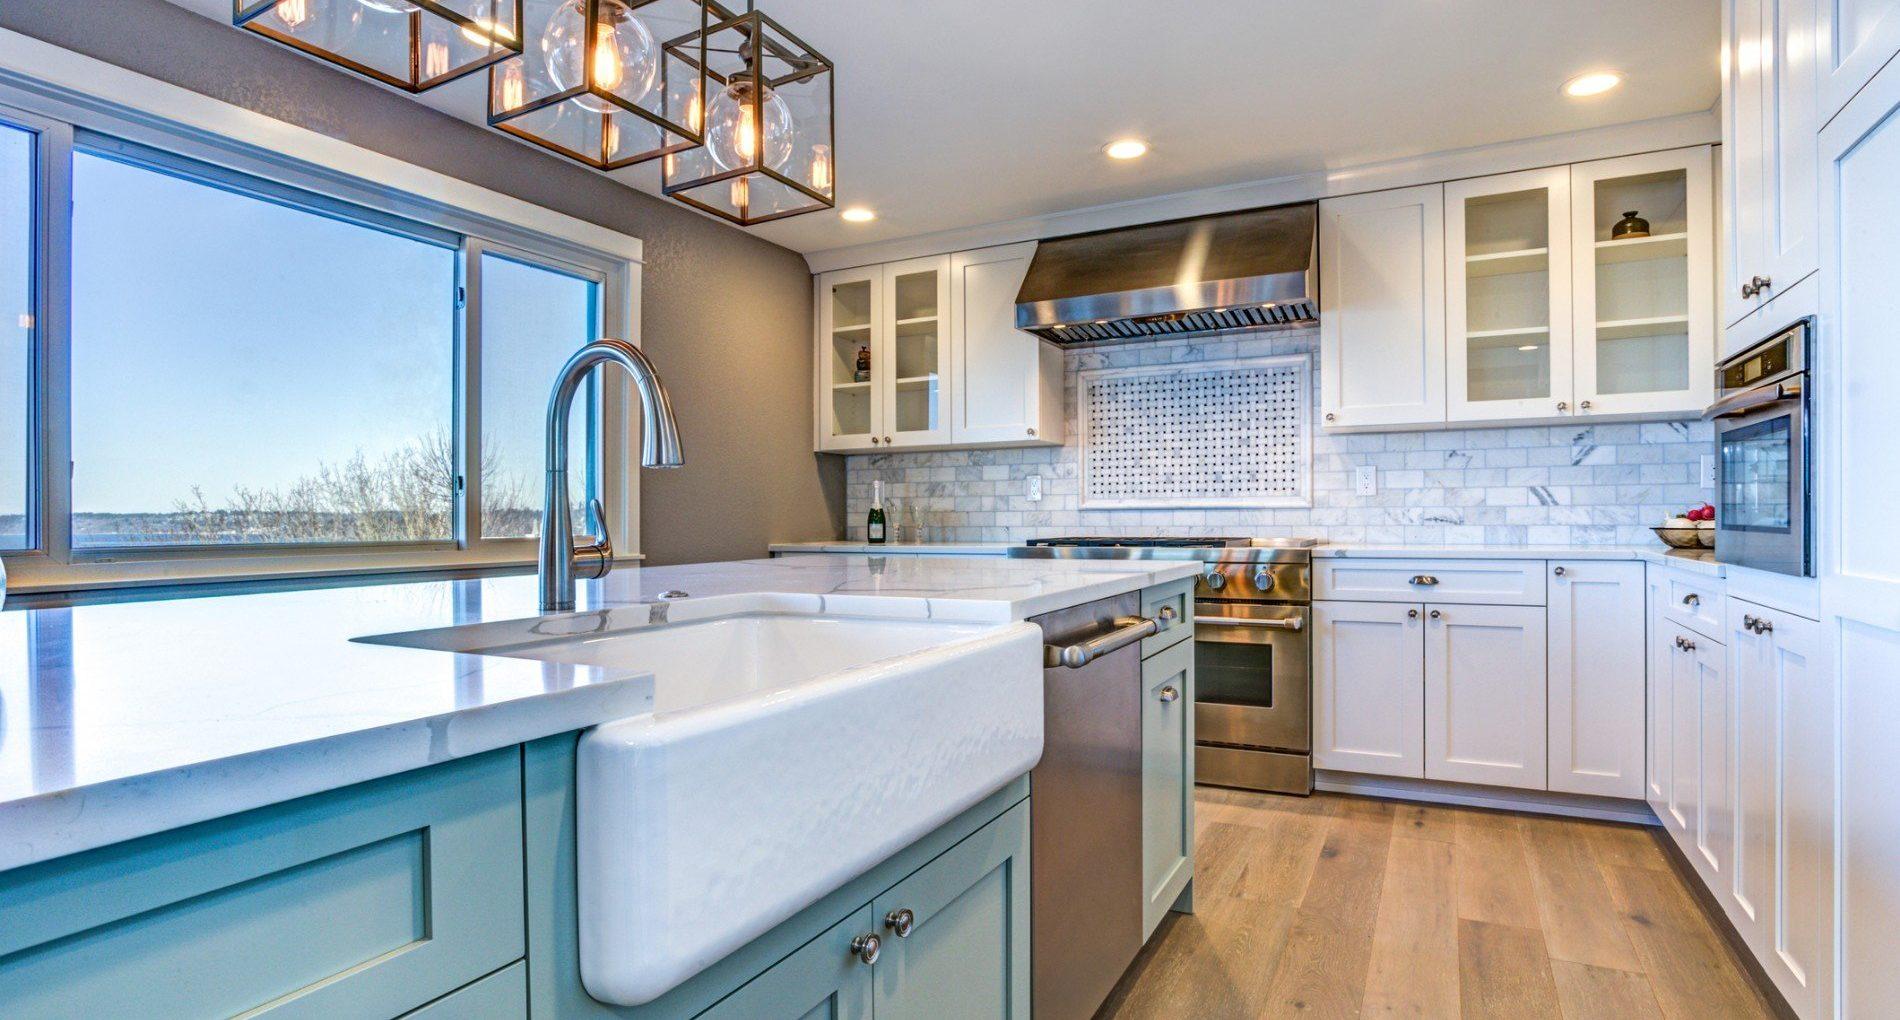 Bringing Blue into Your Camrose Kitchen